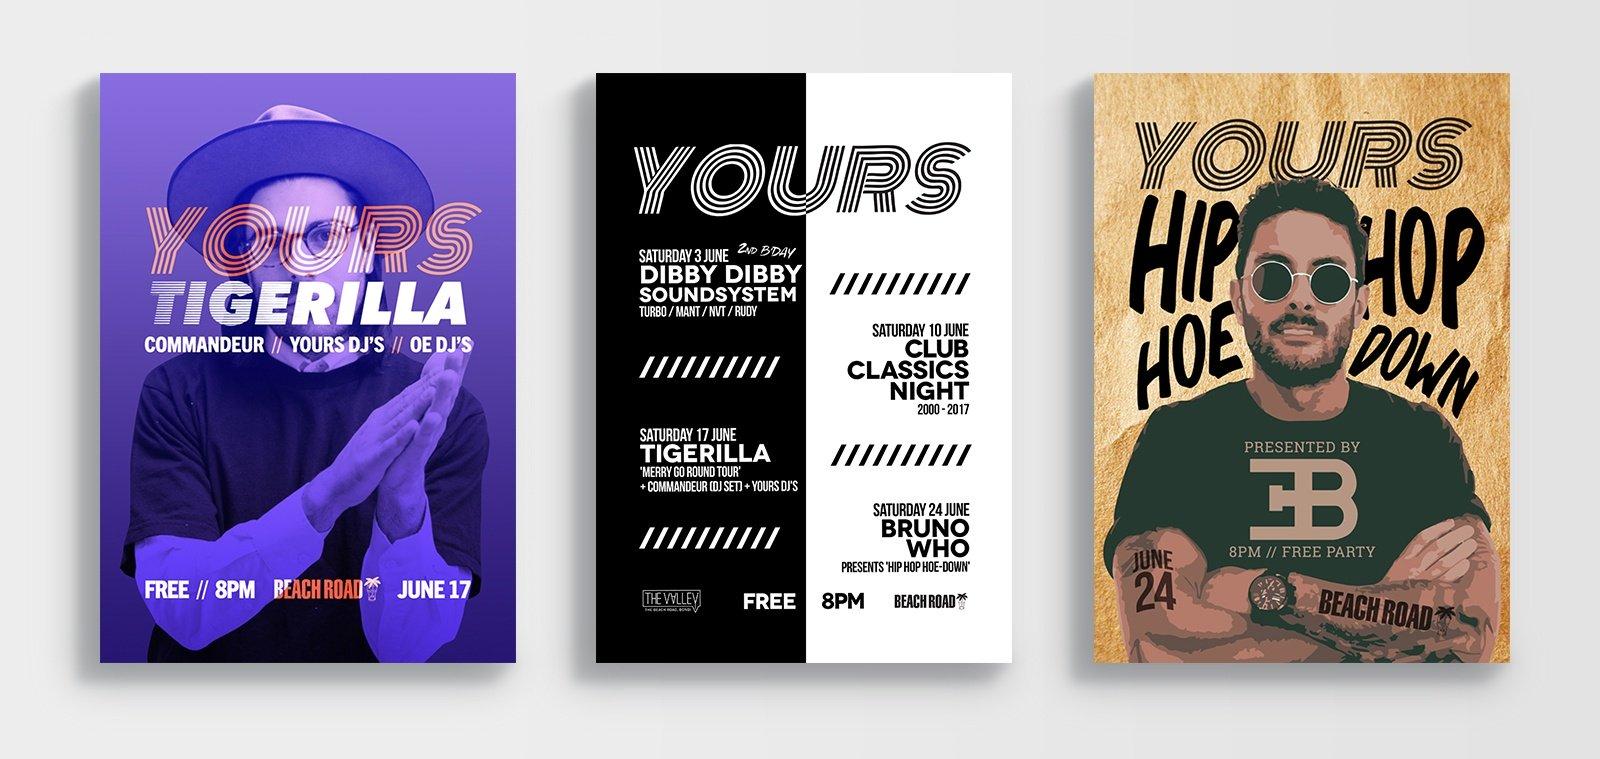 Event posters designed by Sydney Design Social